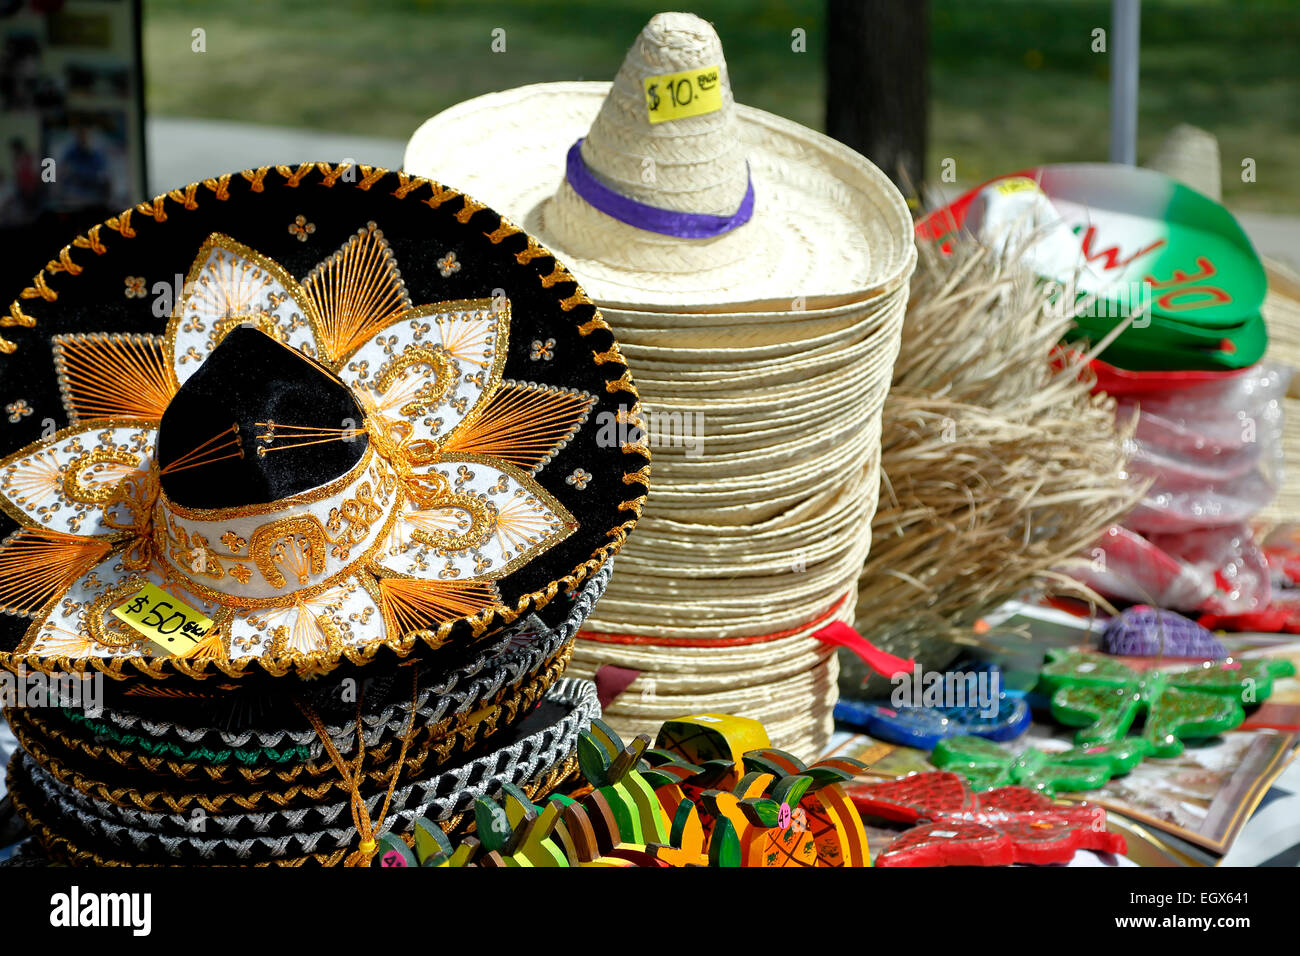 Mexican hats for sale, Cinco de Mayo Celebration, Civic Center Park, Denver, Colorado USA - Stock Image